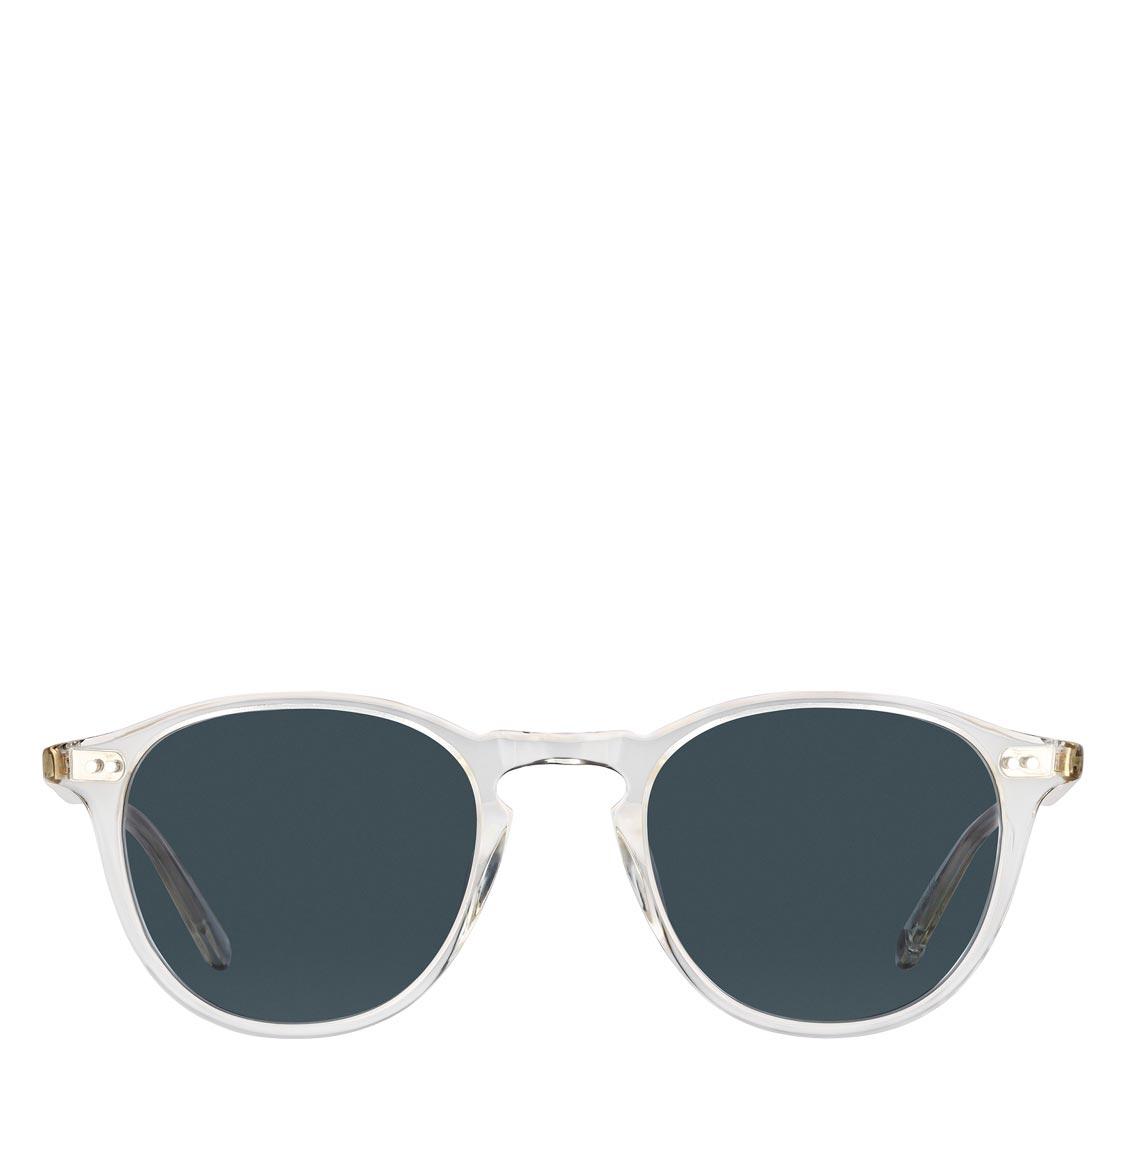 Garrett Leight Square Pure Glass Γυαλιά Ηλίου